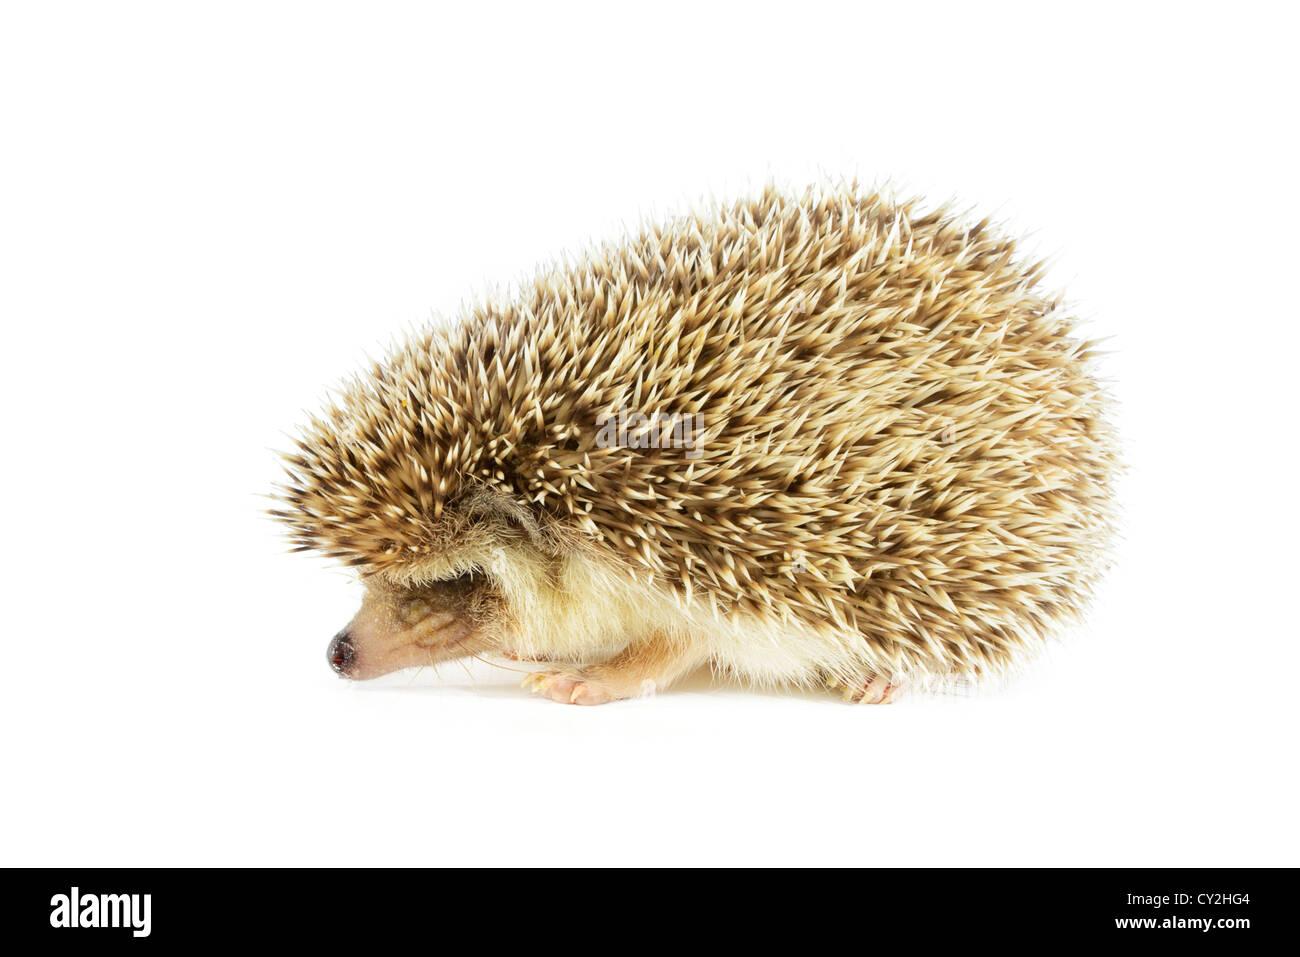 hedgehog on white - Stock Image